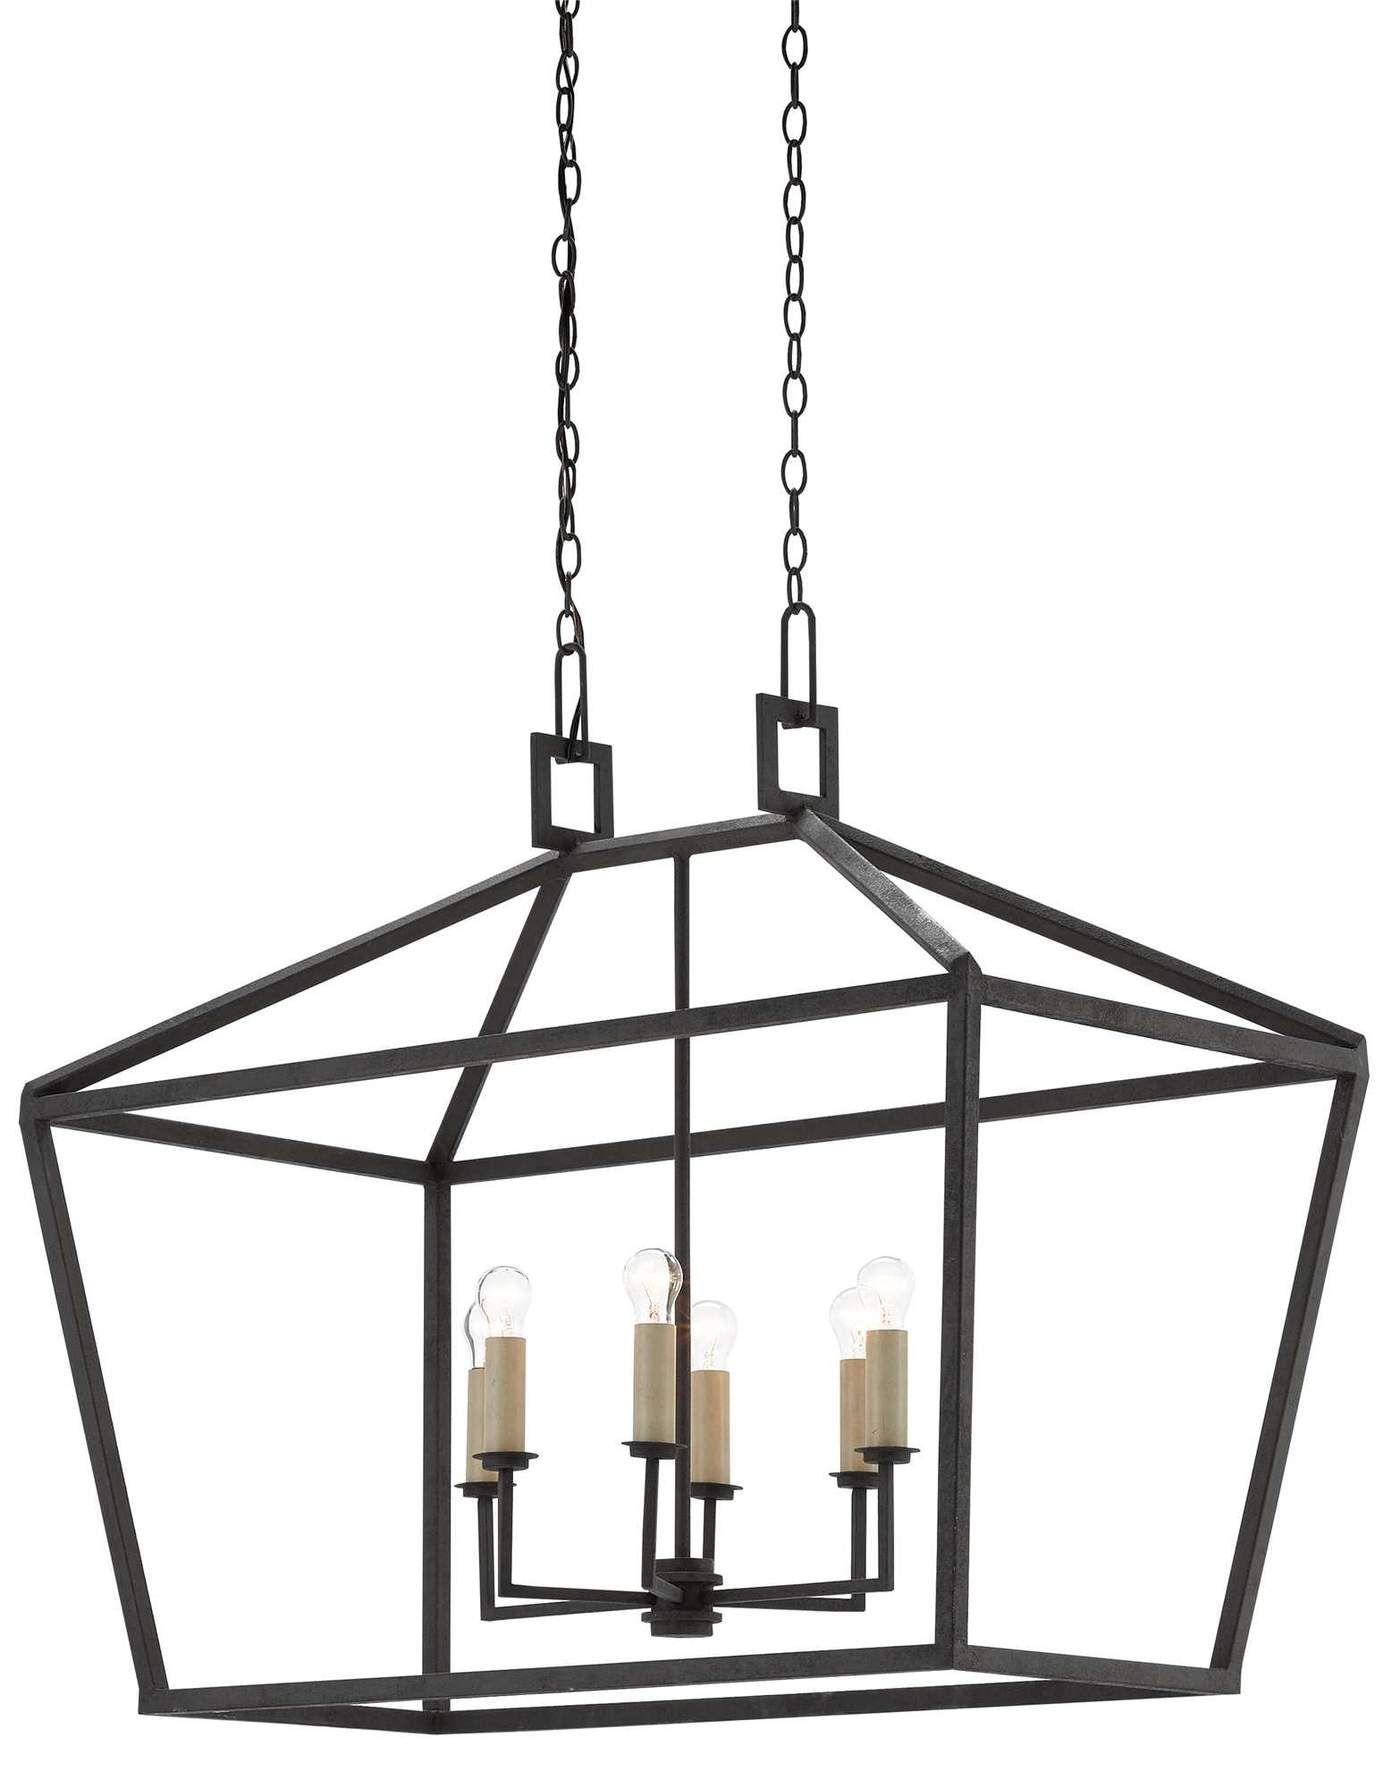 Denison Rectangular Lantern Black Wrought Iron Light Fixtures